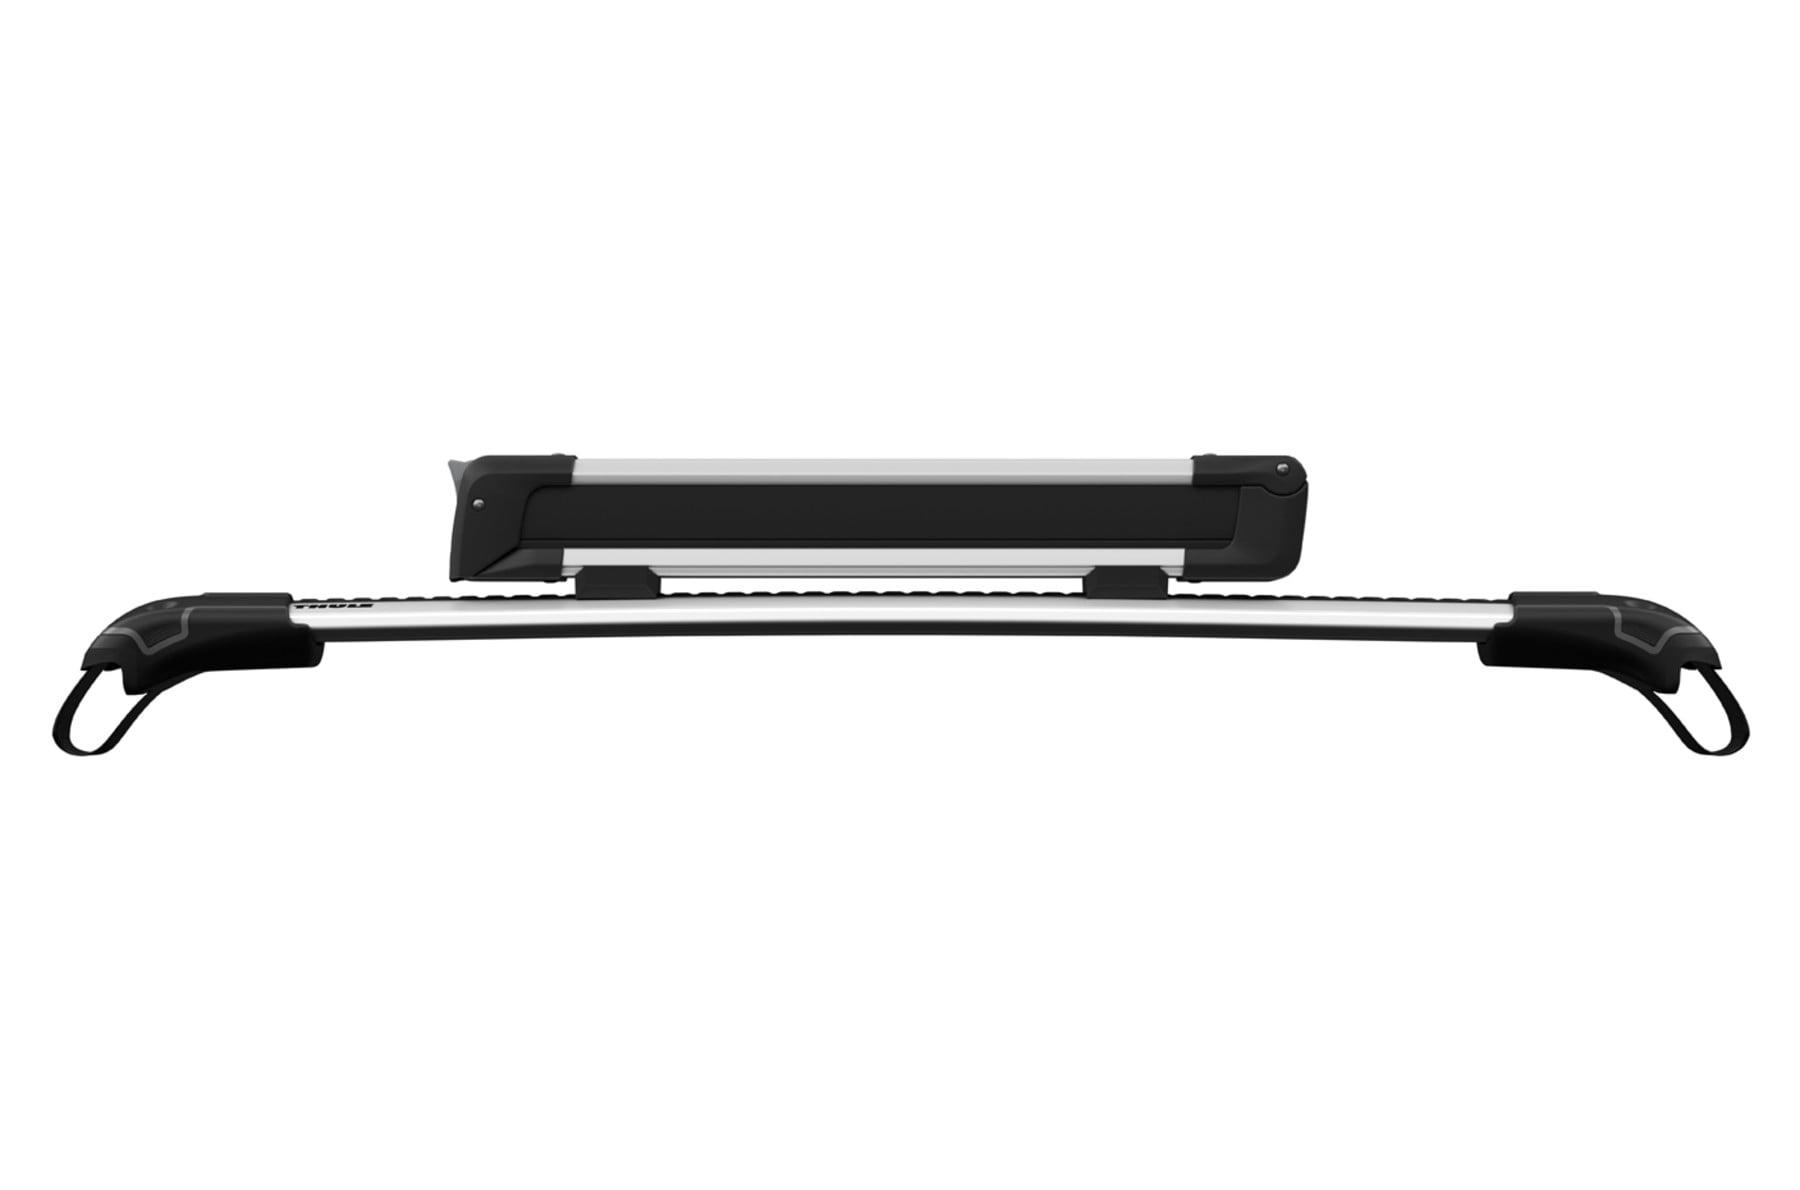 Suport schiuri Thule SnowPack 7326 cu prindere pe bare transversale din aluminiu cu profil T 3